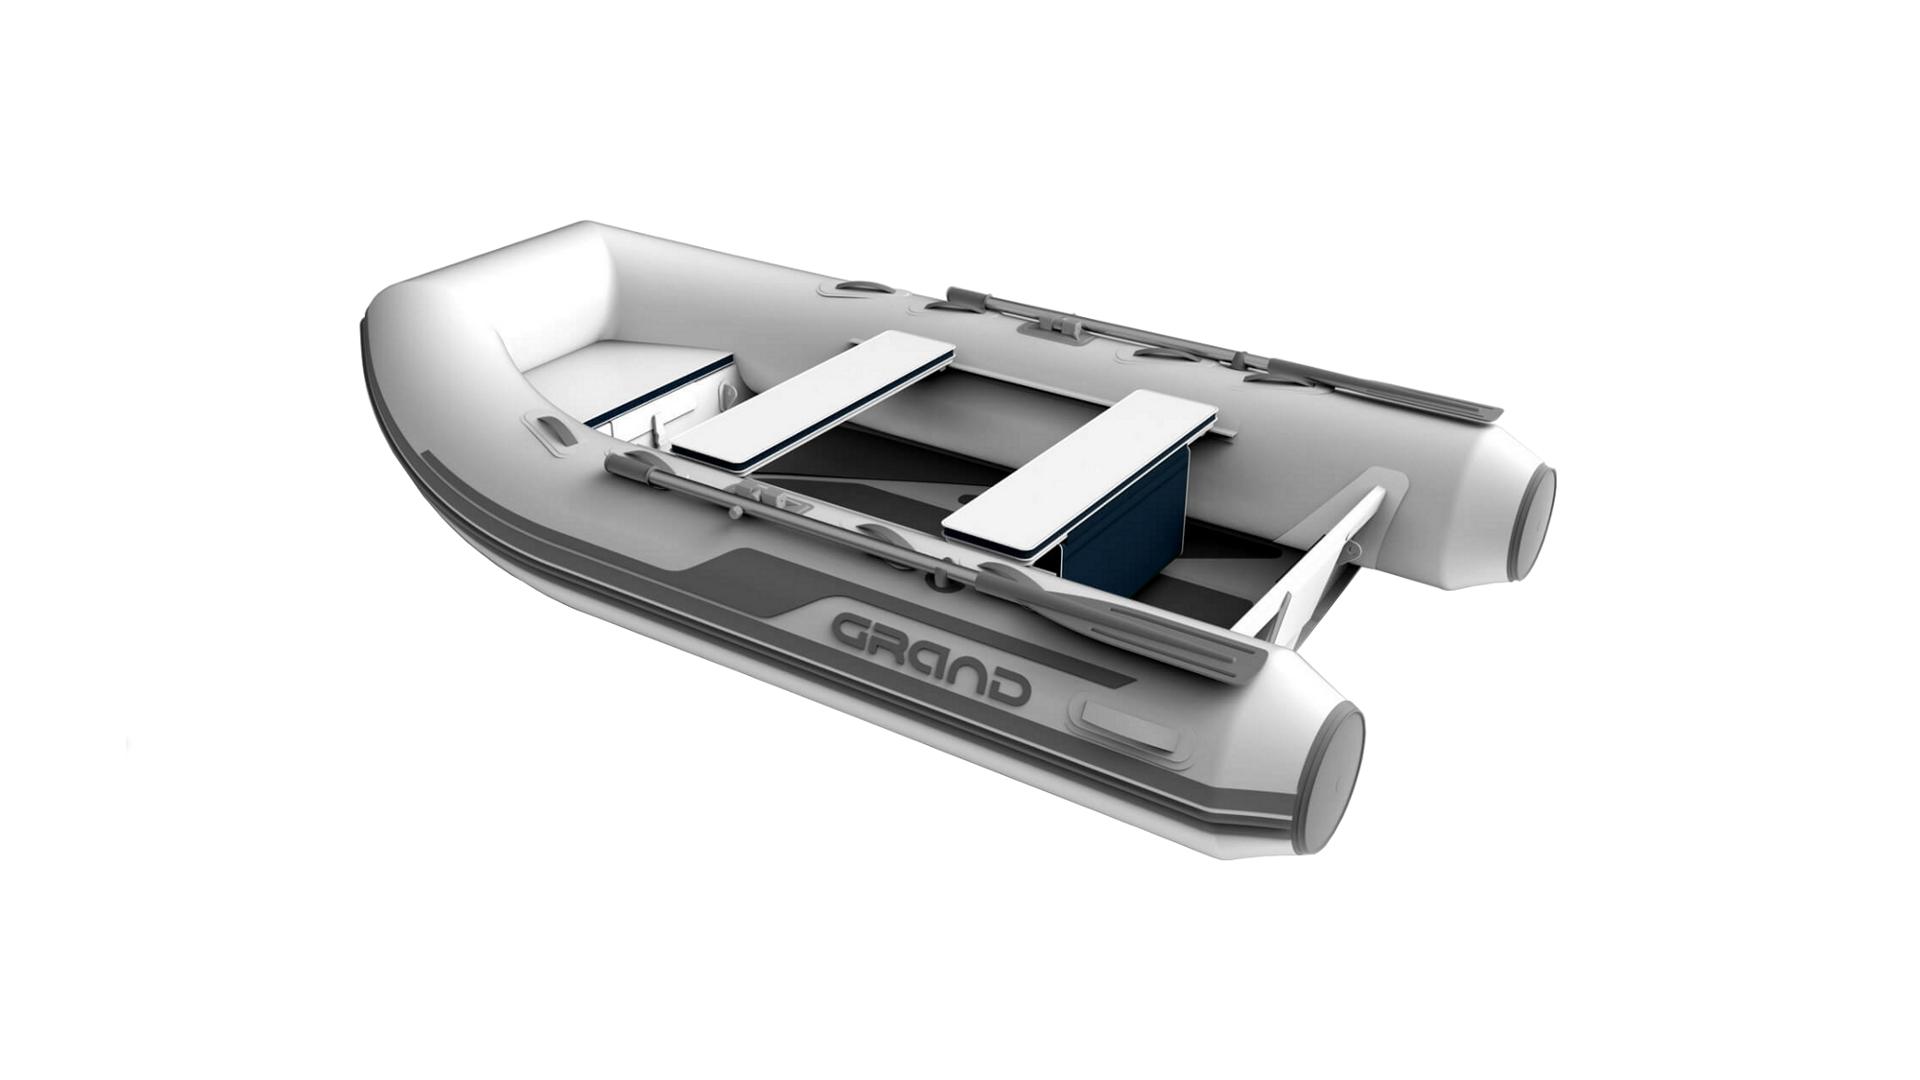 Надувная лодка с жестким алюминиевым дном GRAND Aluminum Line Alu300D, Надувная лодка GRAND Aluminum Line Alu270D, GRAND Aluminum Line Alu270D, GRAND Alu270D, Надувная лодка GRAND, Надувная лодка ГРАНД, Надувная лодка с жестким дном, RIB, Rigid Inflatable Boats